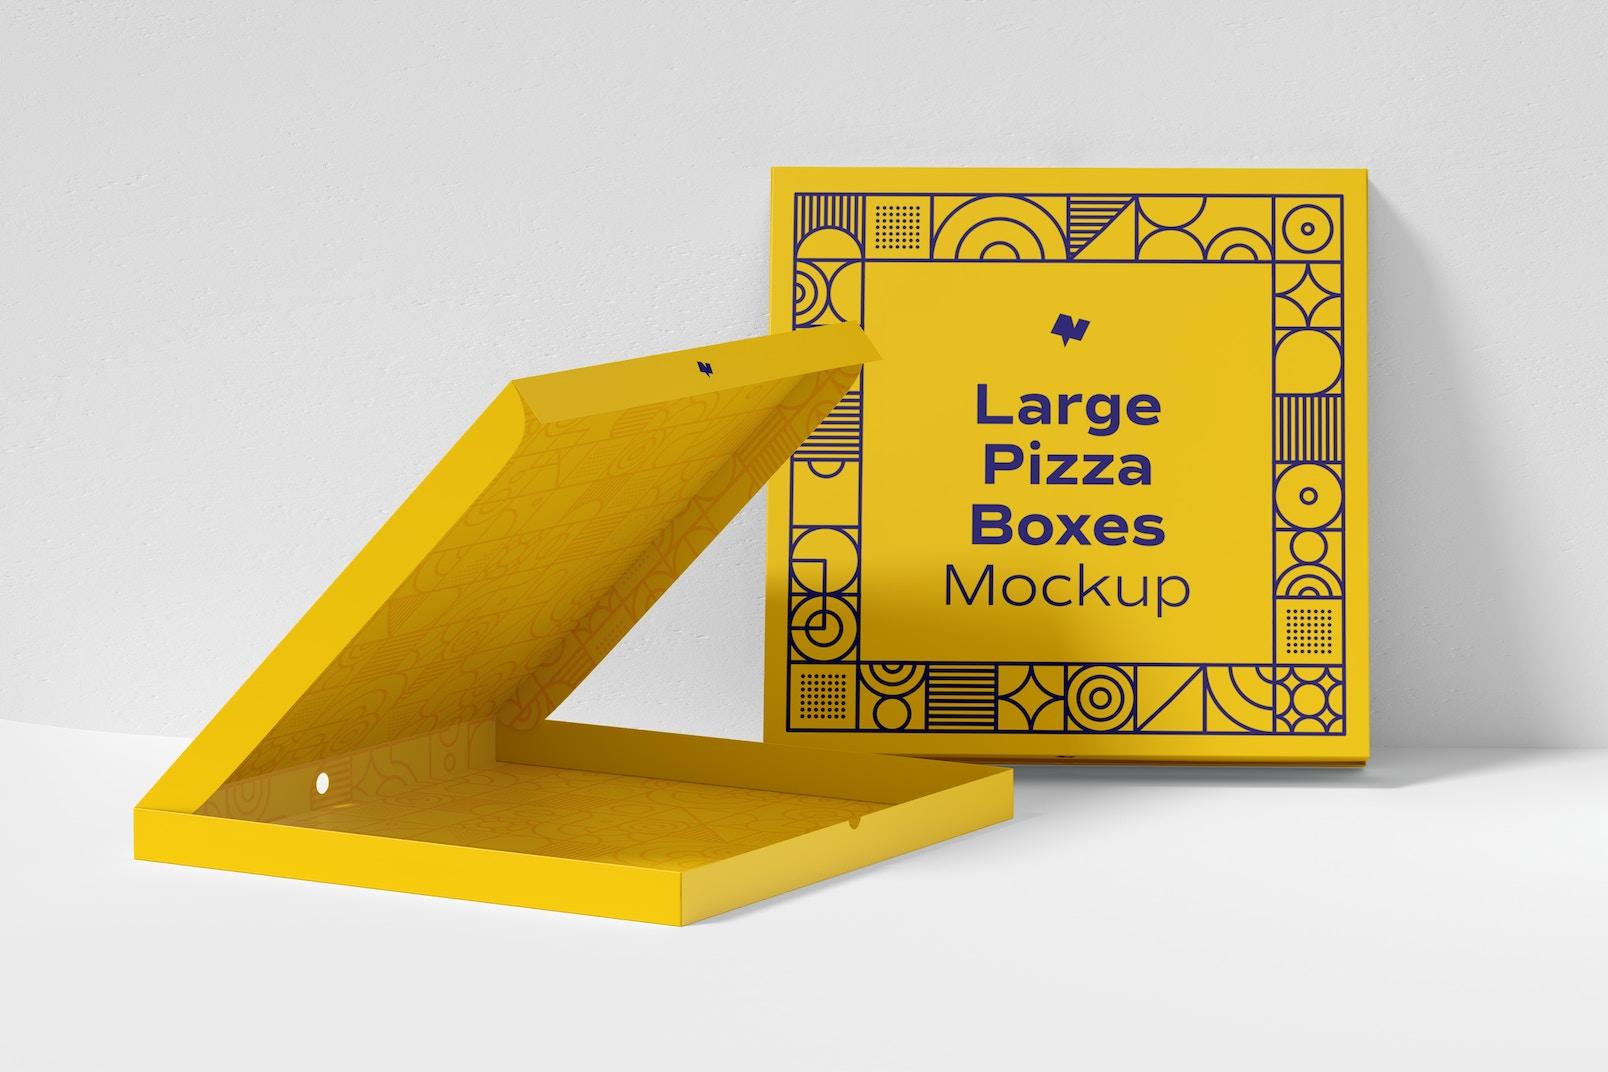 Large Pizza Box Mockup, Leaned